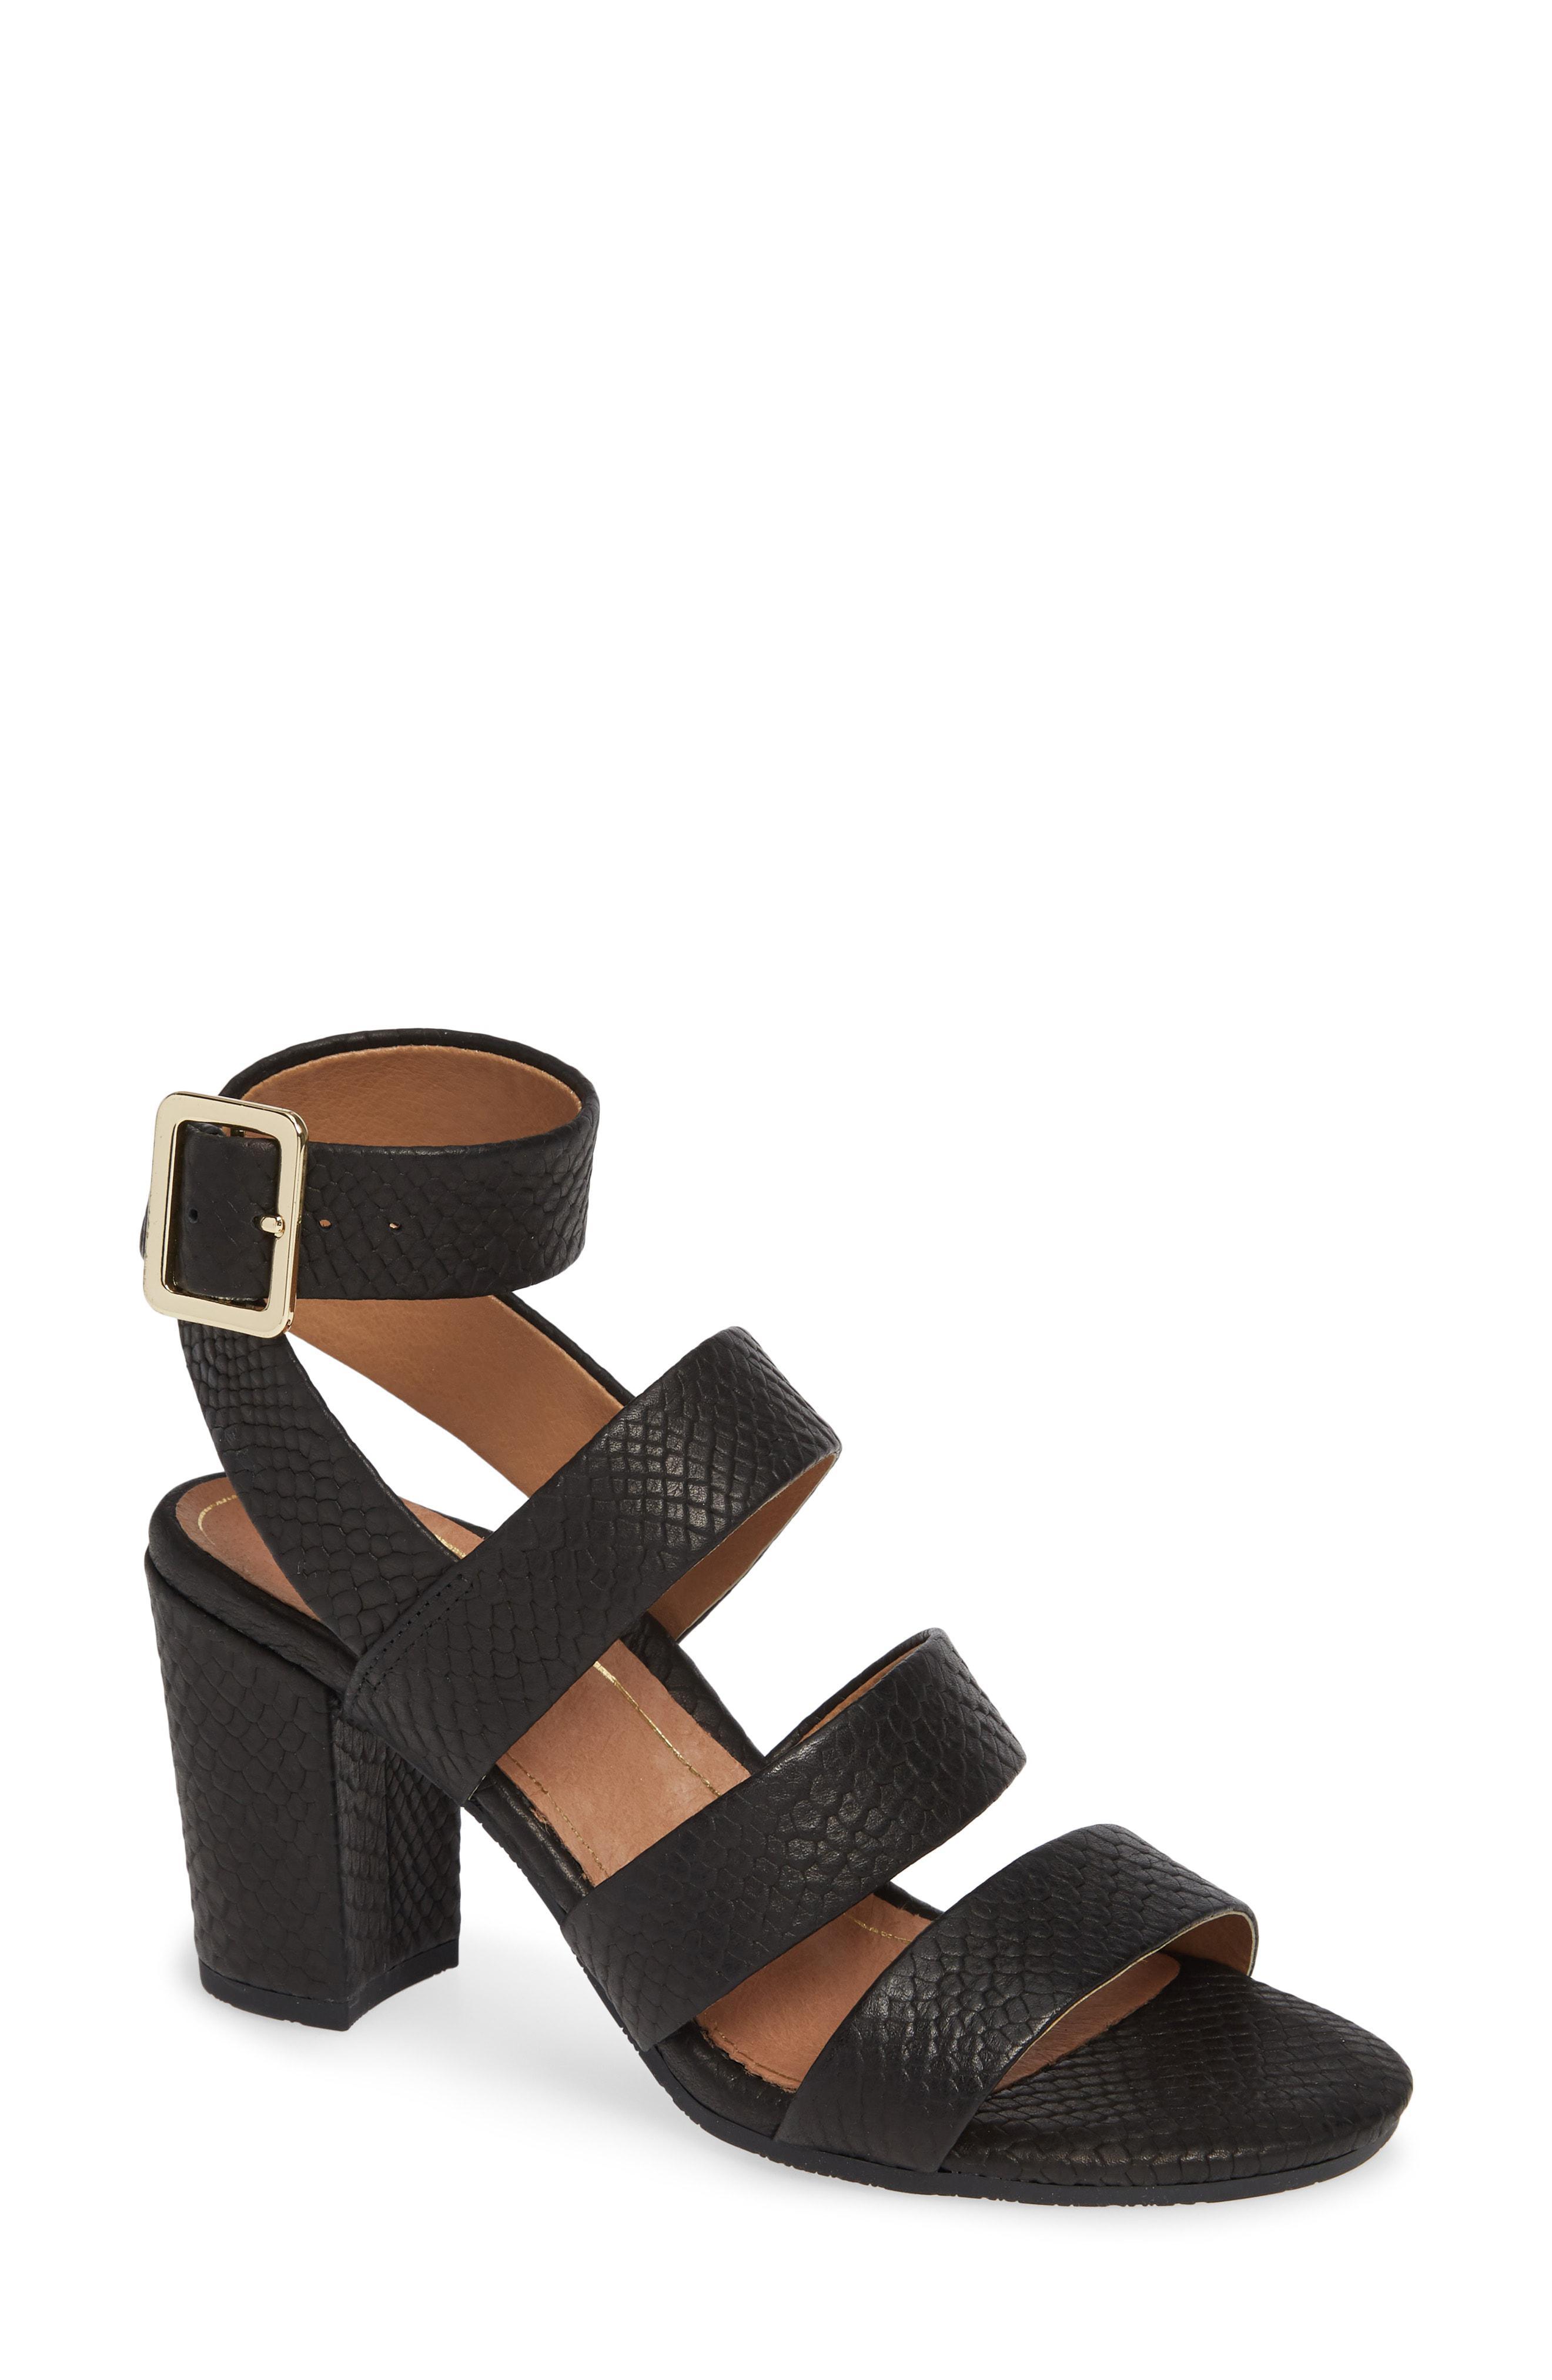 9d1d24f6f607 Lyst - Vionic Blaire Block Heel Sandal in Brown